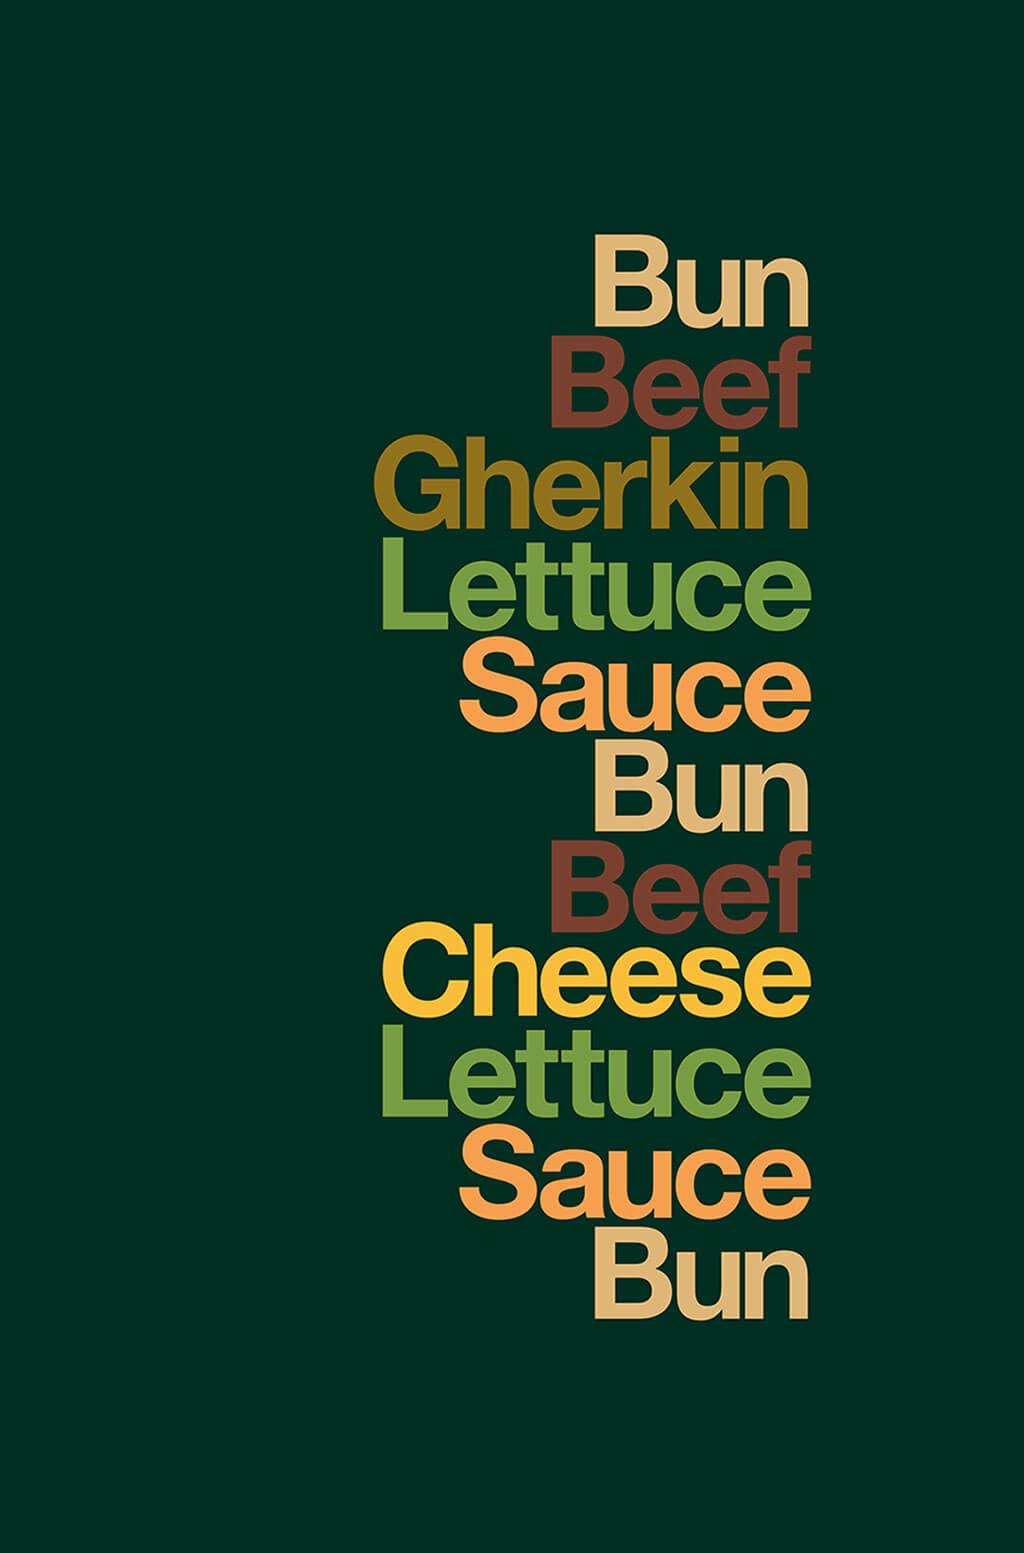 Minimalist OOH Big Mac ad